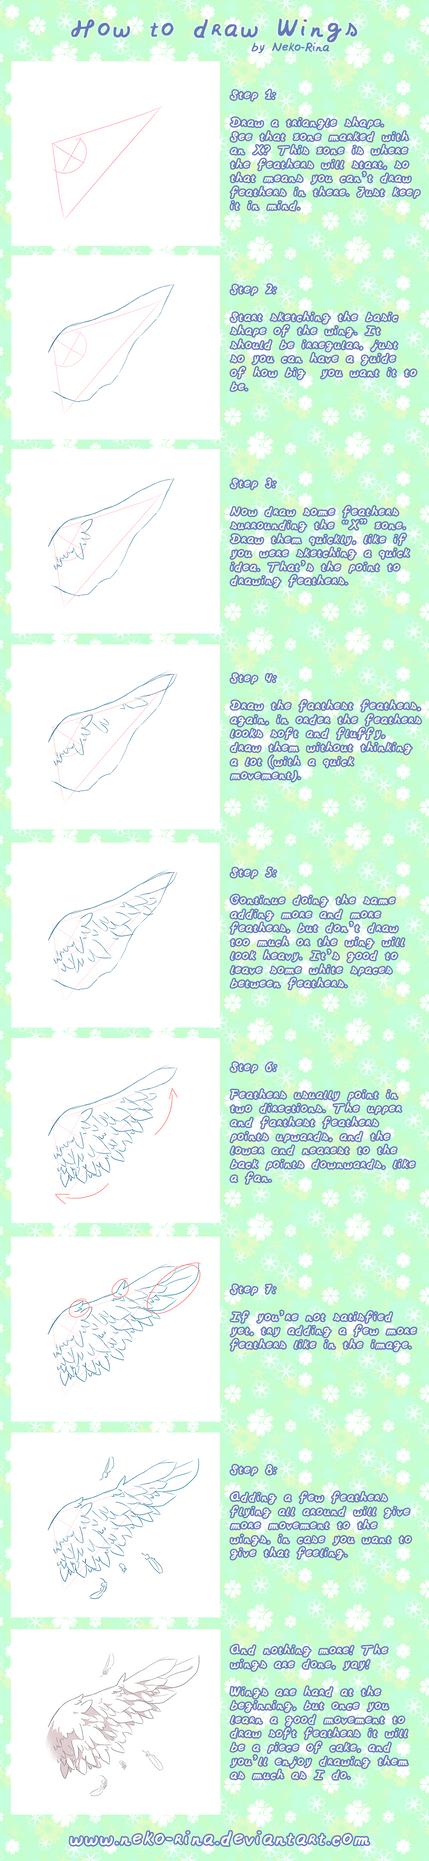 How To Draw Wings by Neko-Rina